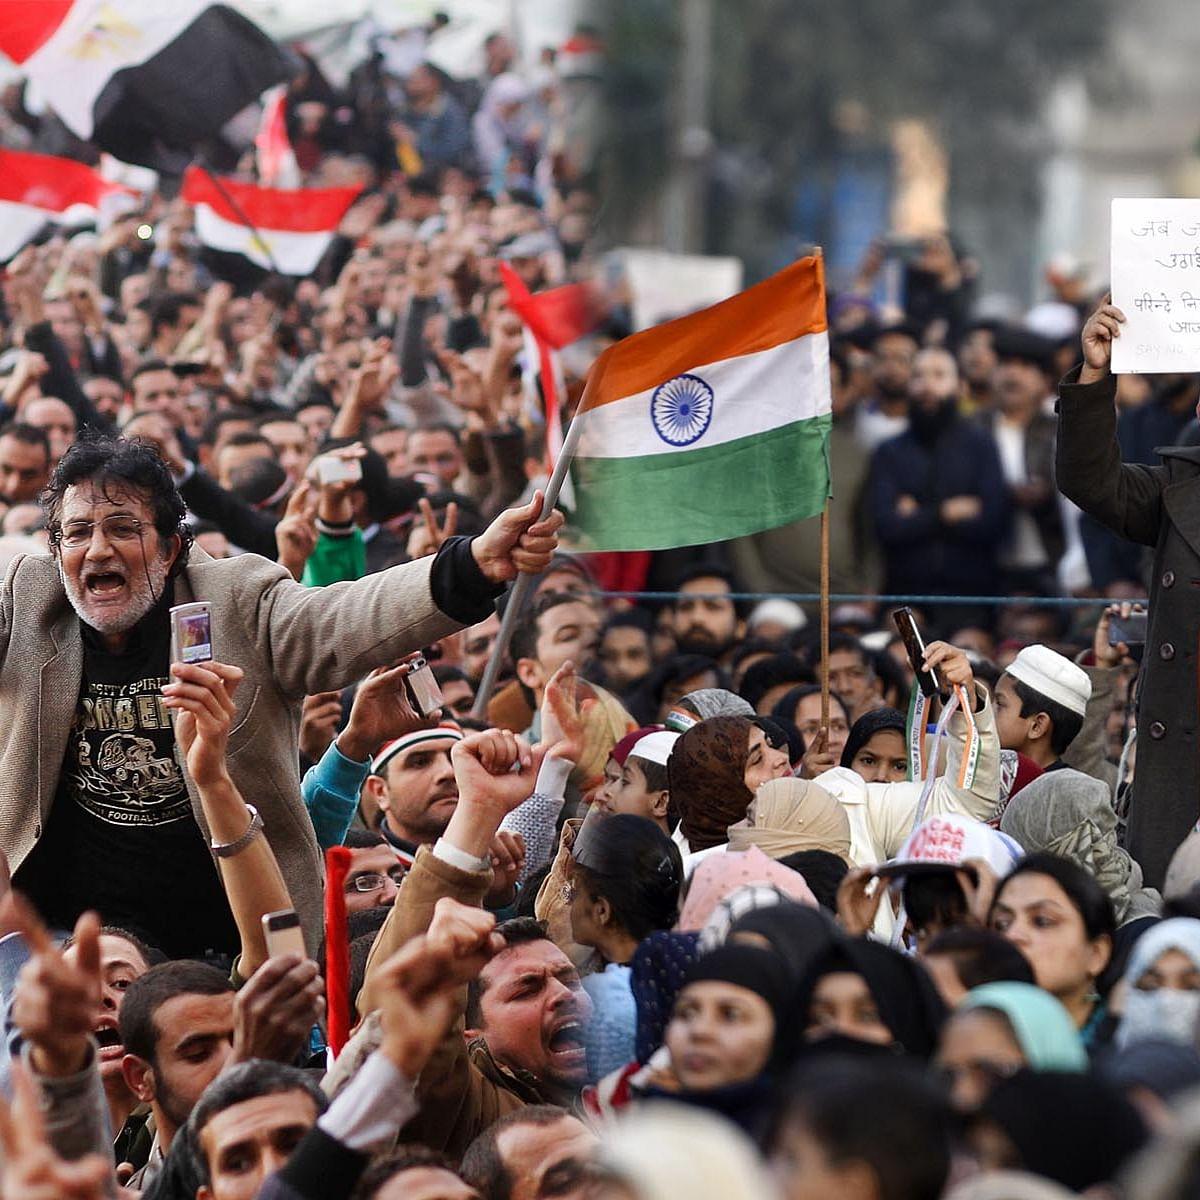 عرب بہار اور شاہین باغ / Getty Images